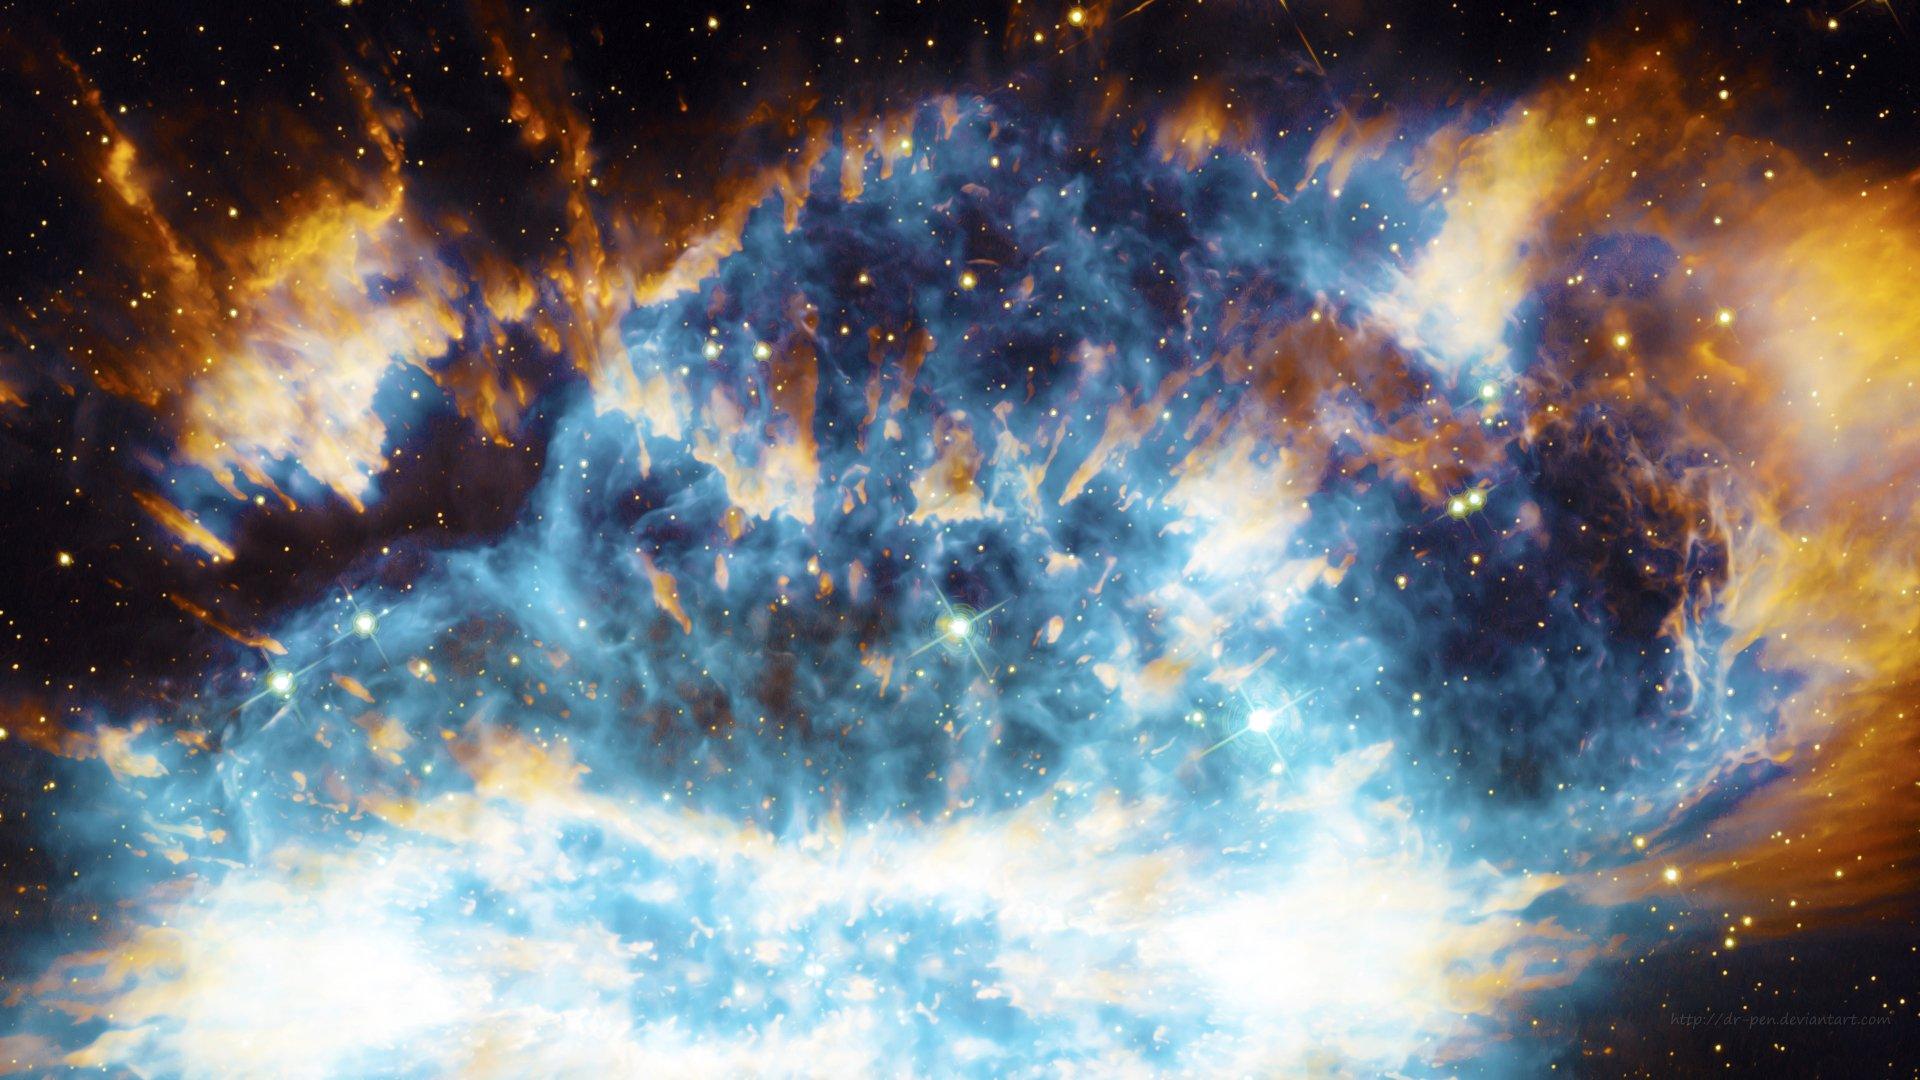 Cool Space Iphone Wallpaper Stark Blue Nebula Photomanipulated Wallpaper 4k Ultra Hd